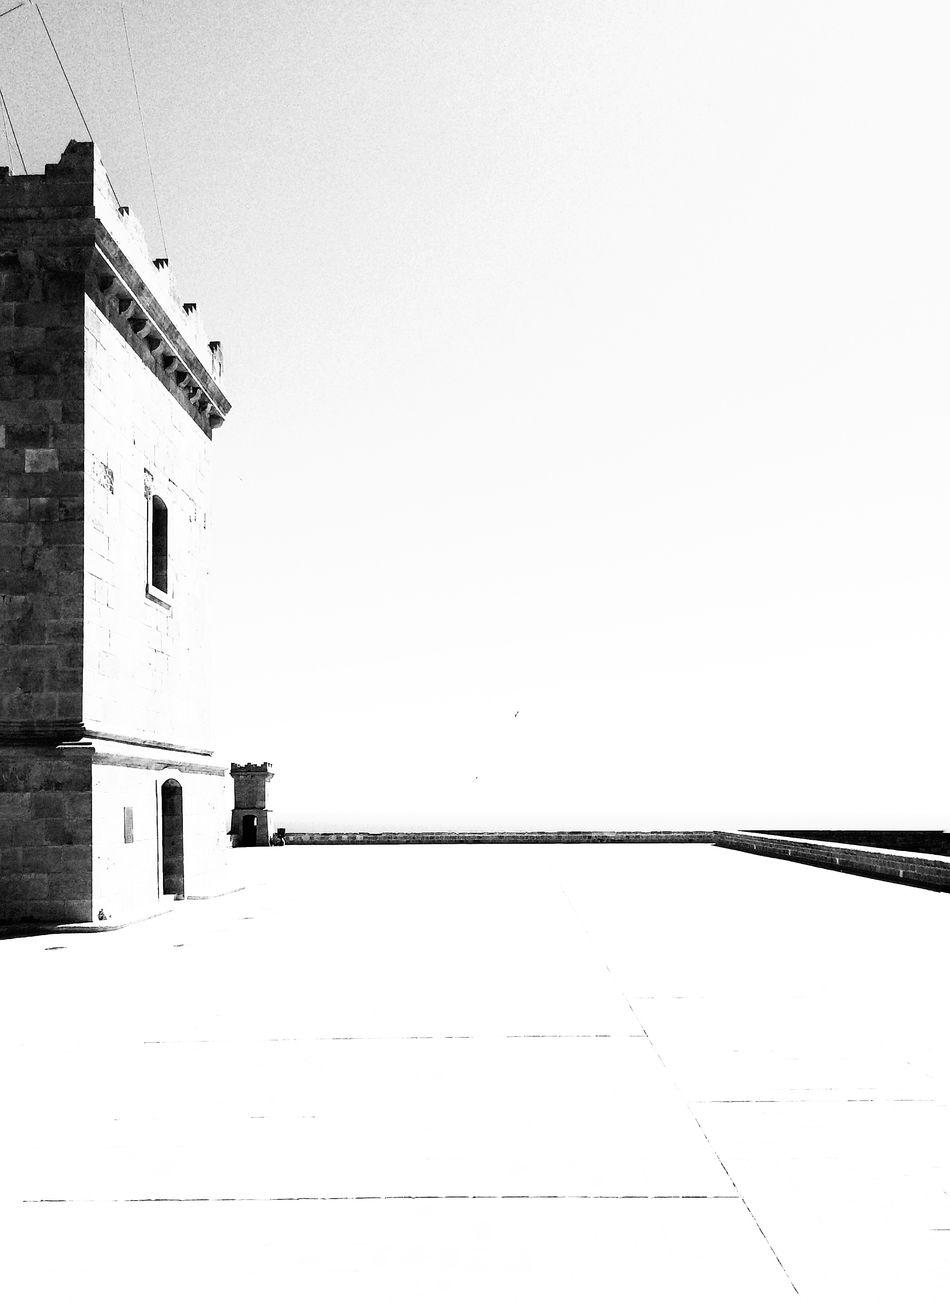 Montjuic Barcelona España Blackandwhite Photography Minimalobsession Negro Black Blanco White